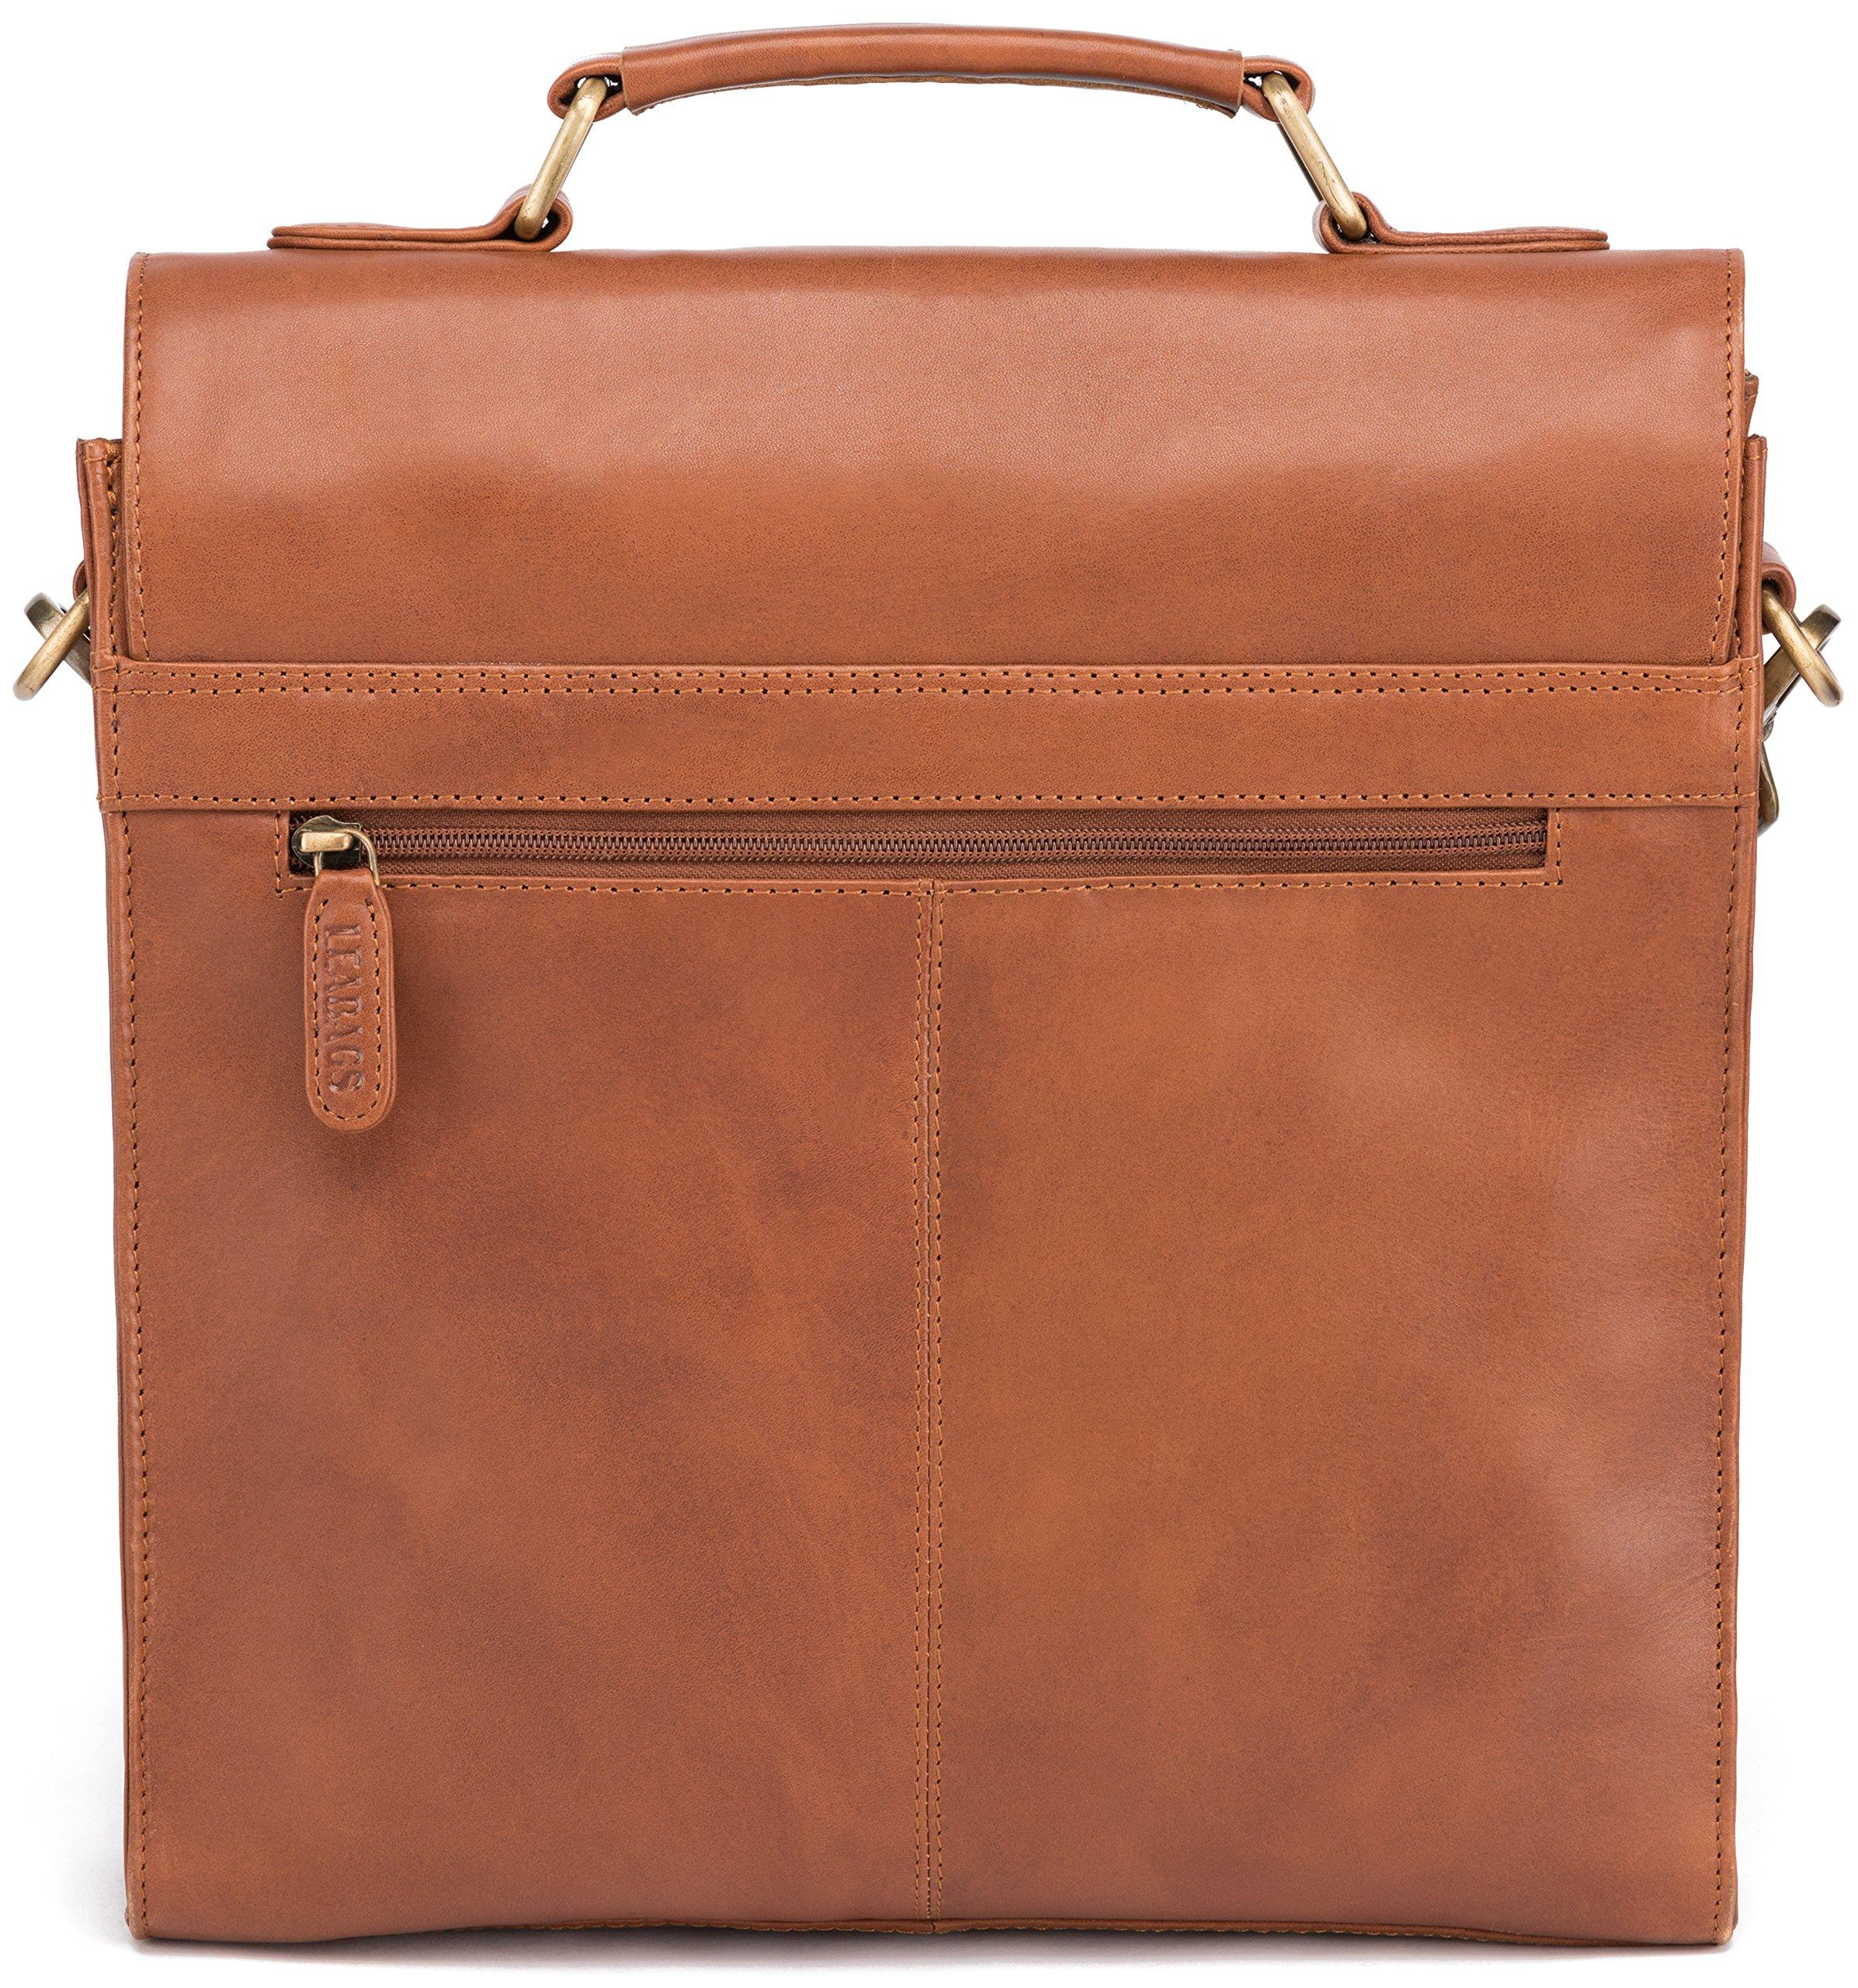 A1M4knEolZL - LEABAGS Lille maletín de auténtico Cuero búfalo en el Estilo Vintage